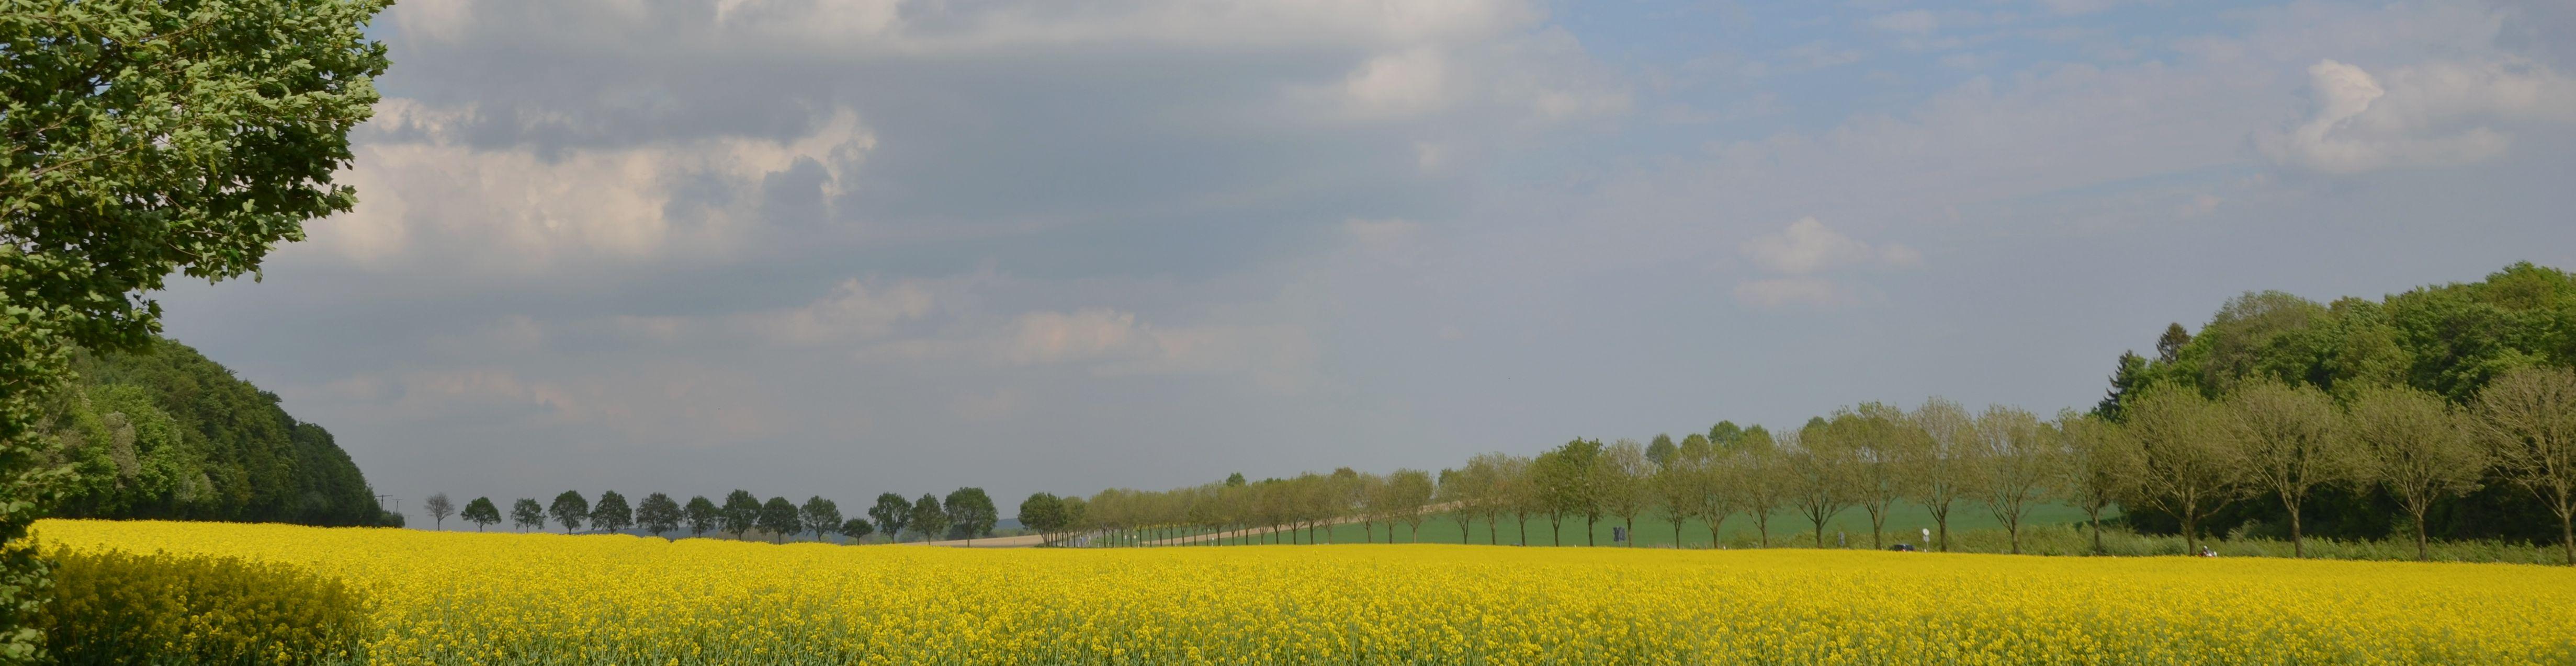 rapeseed-scenery